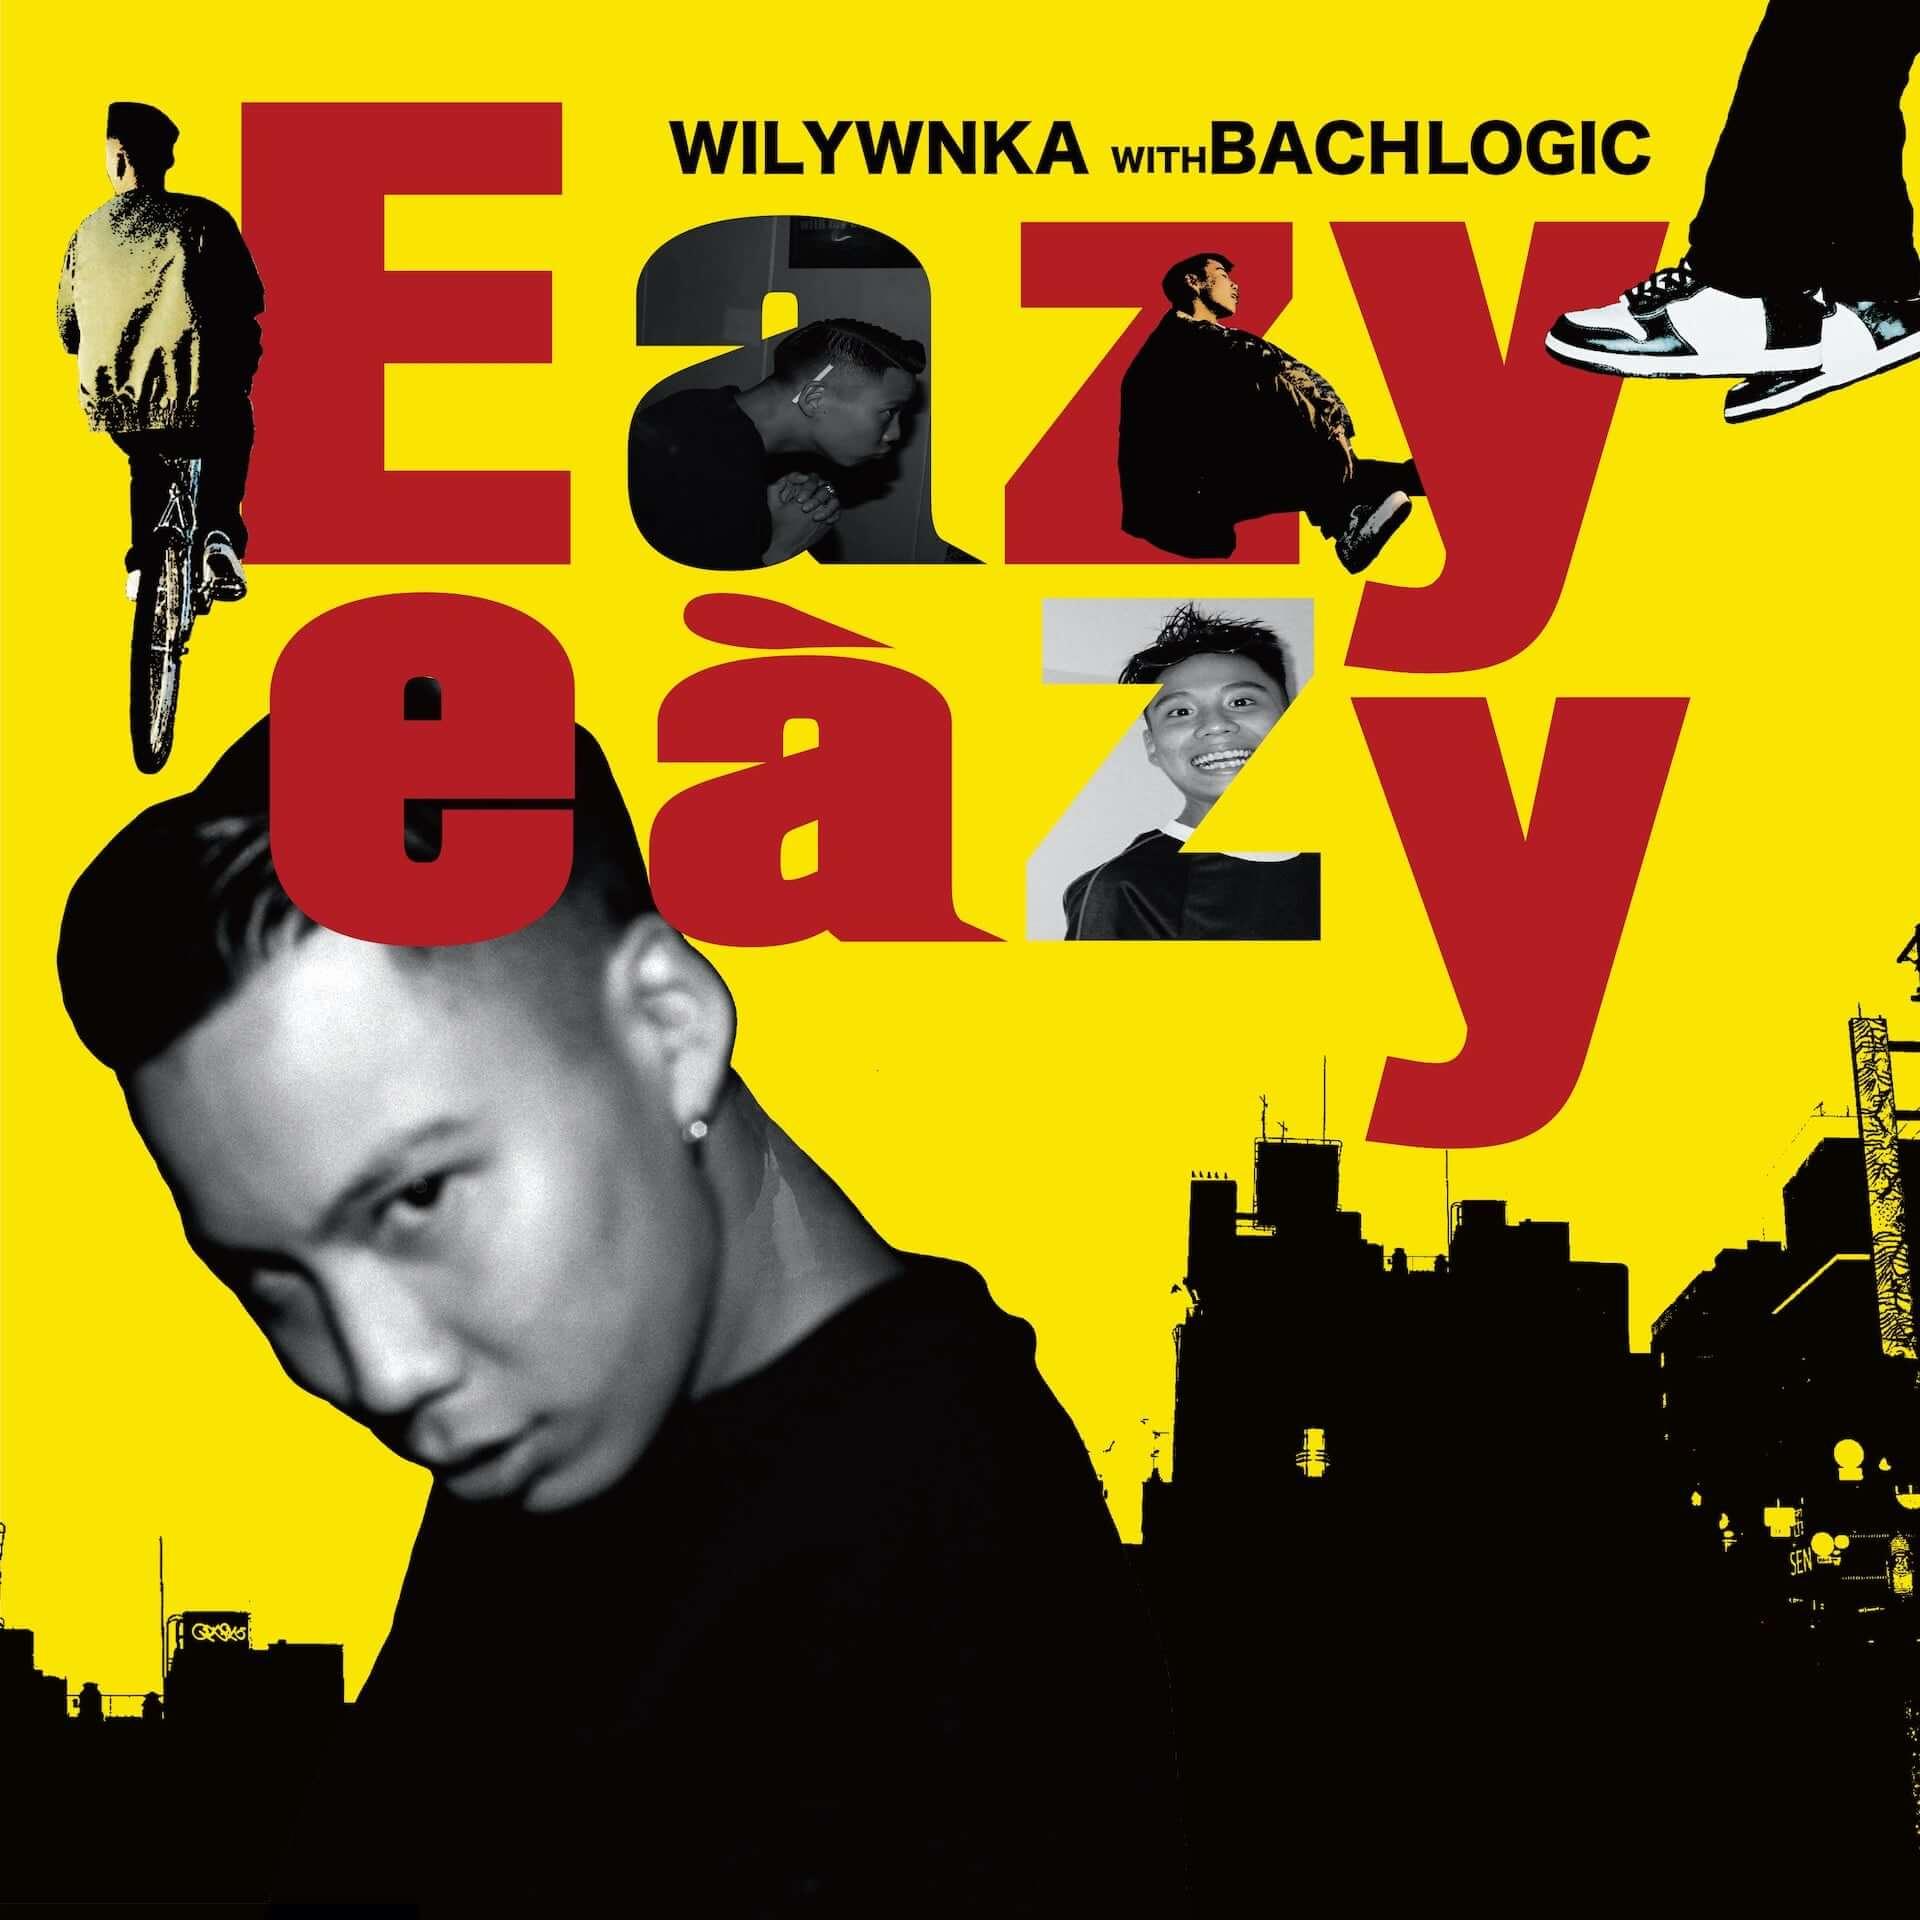 WILYWNKA最新EP『EAZY EAZY』リリース記念!Whimsyとのコラボソックスやコーチジャケット、パーカーなどの新グッズが登場 lf201207_wilywnka_4-1920x1920